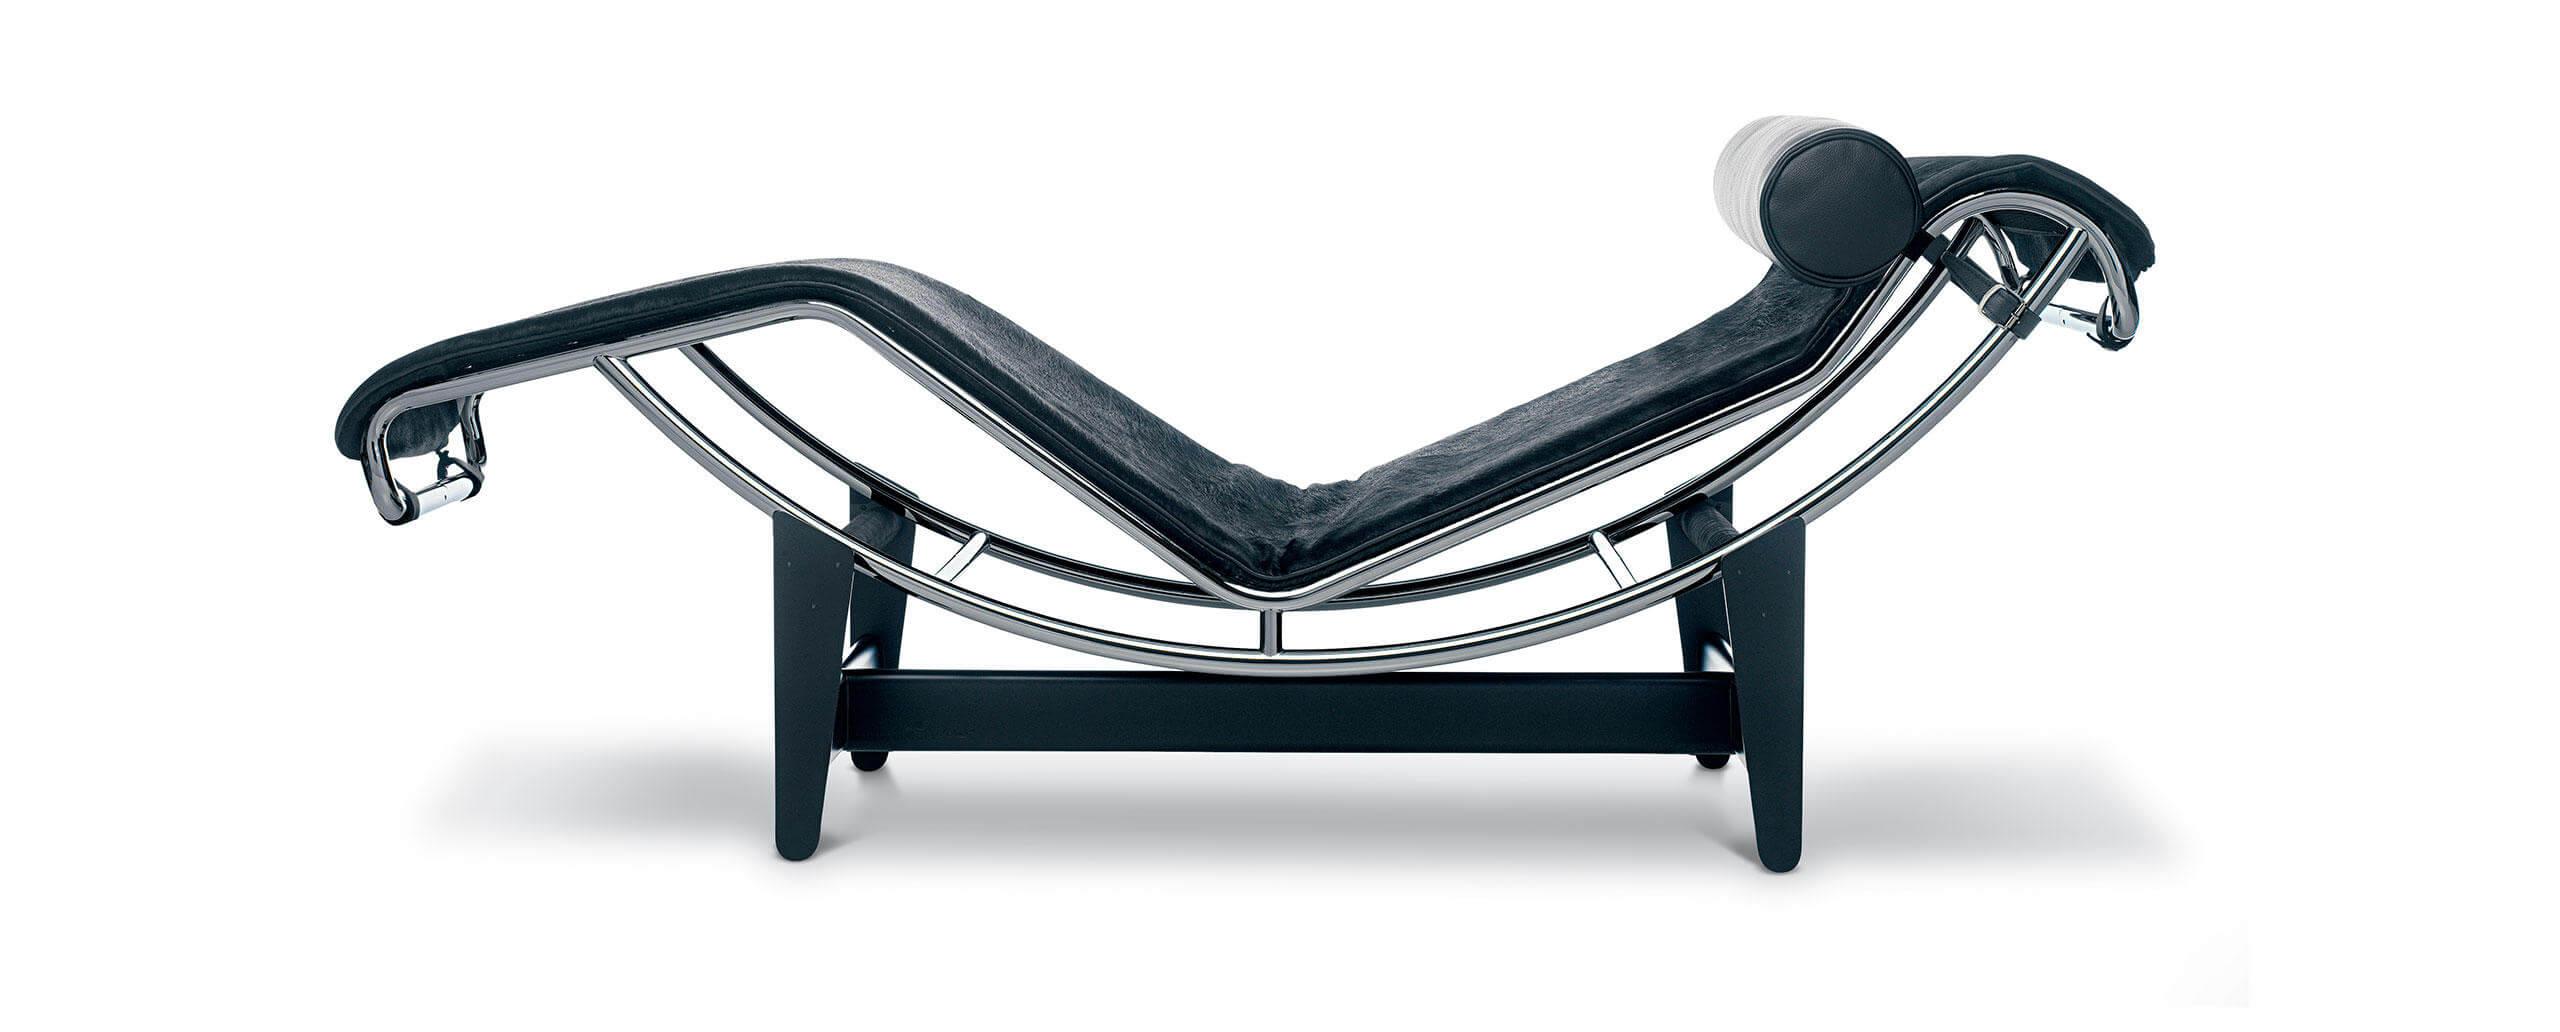 Two Design Lovers Cassina Corbusier LC4